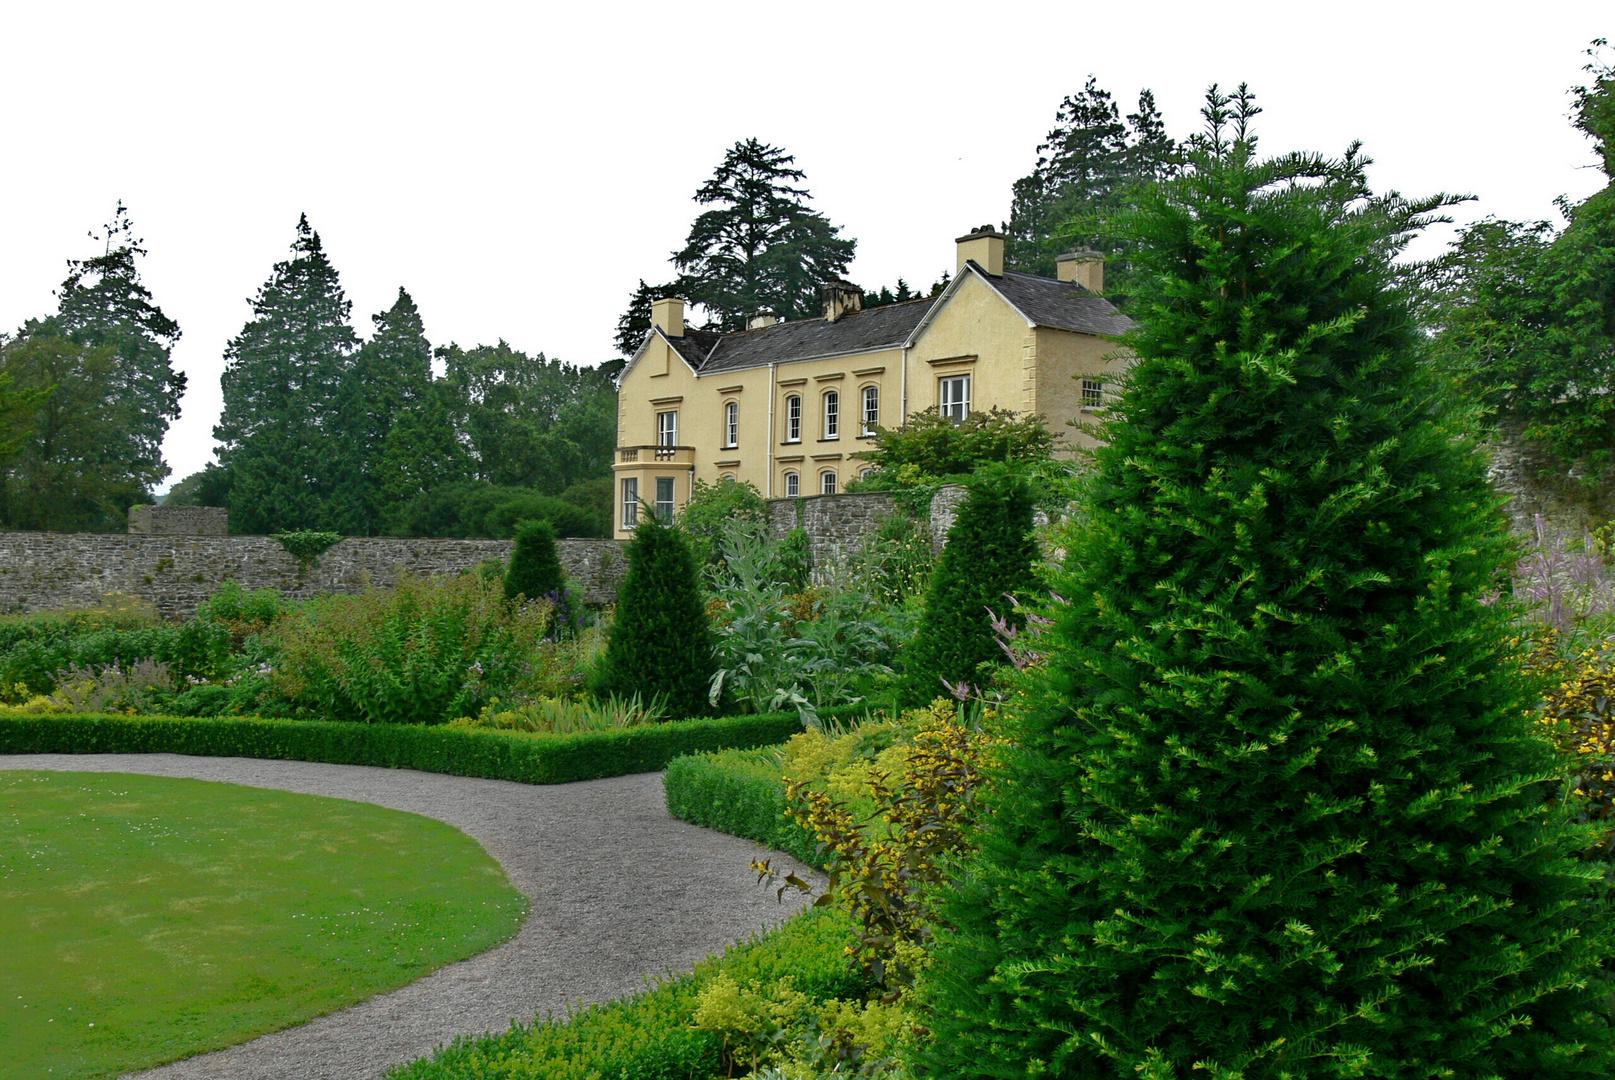 Aberglasney House and Gardens III